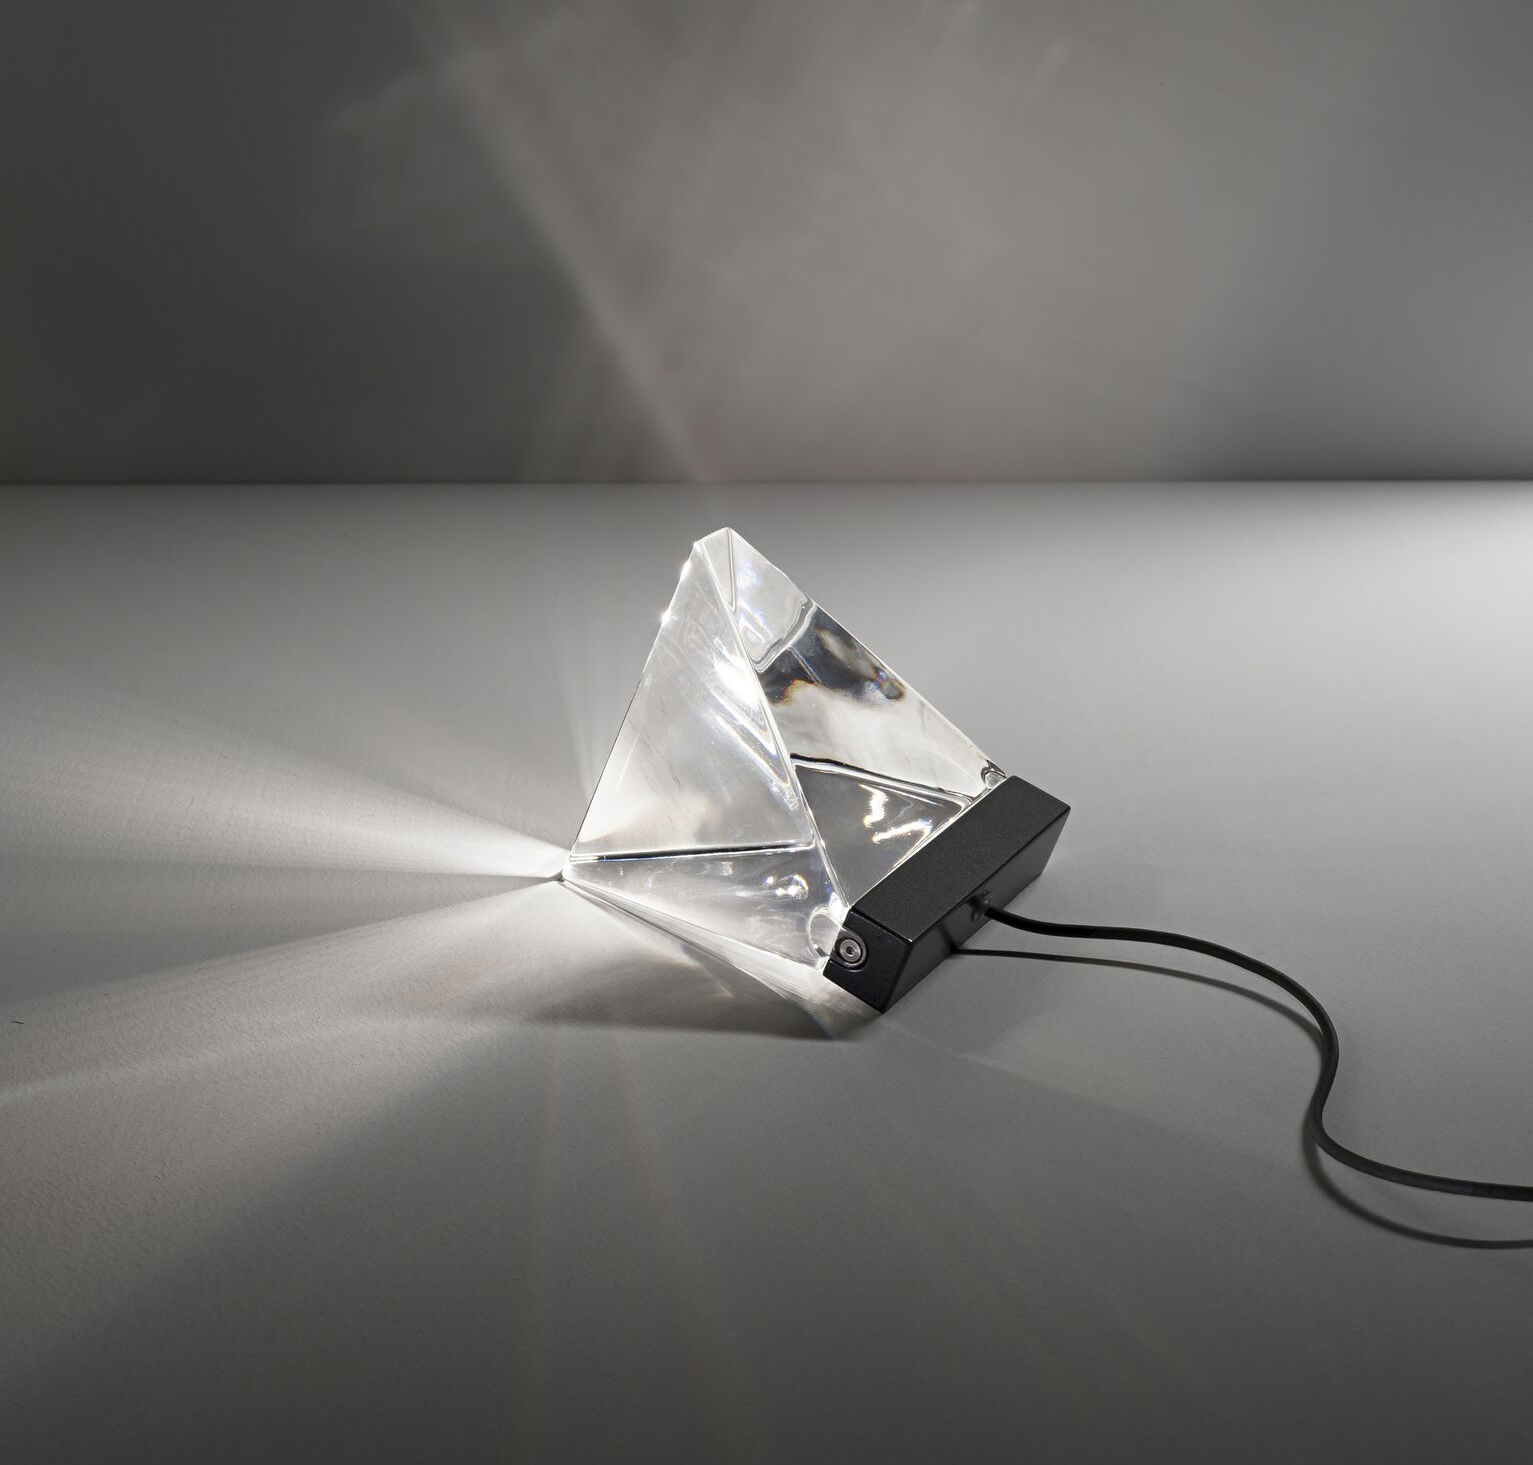 lampe poser tripla f41 anthracite led l9 8cm h7 5cm fabbian luminaires nedgis. Black Bedroom Furniture Sets. Home Design Ideas